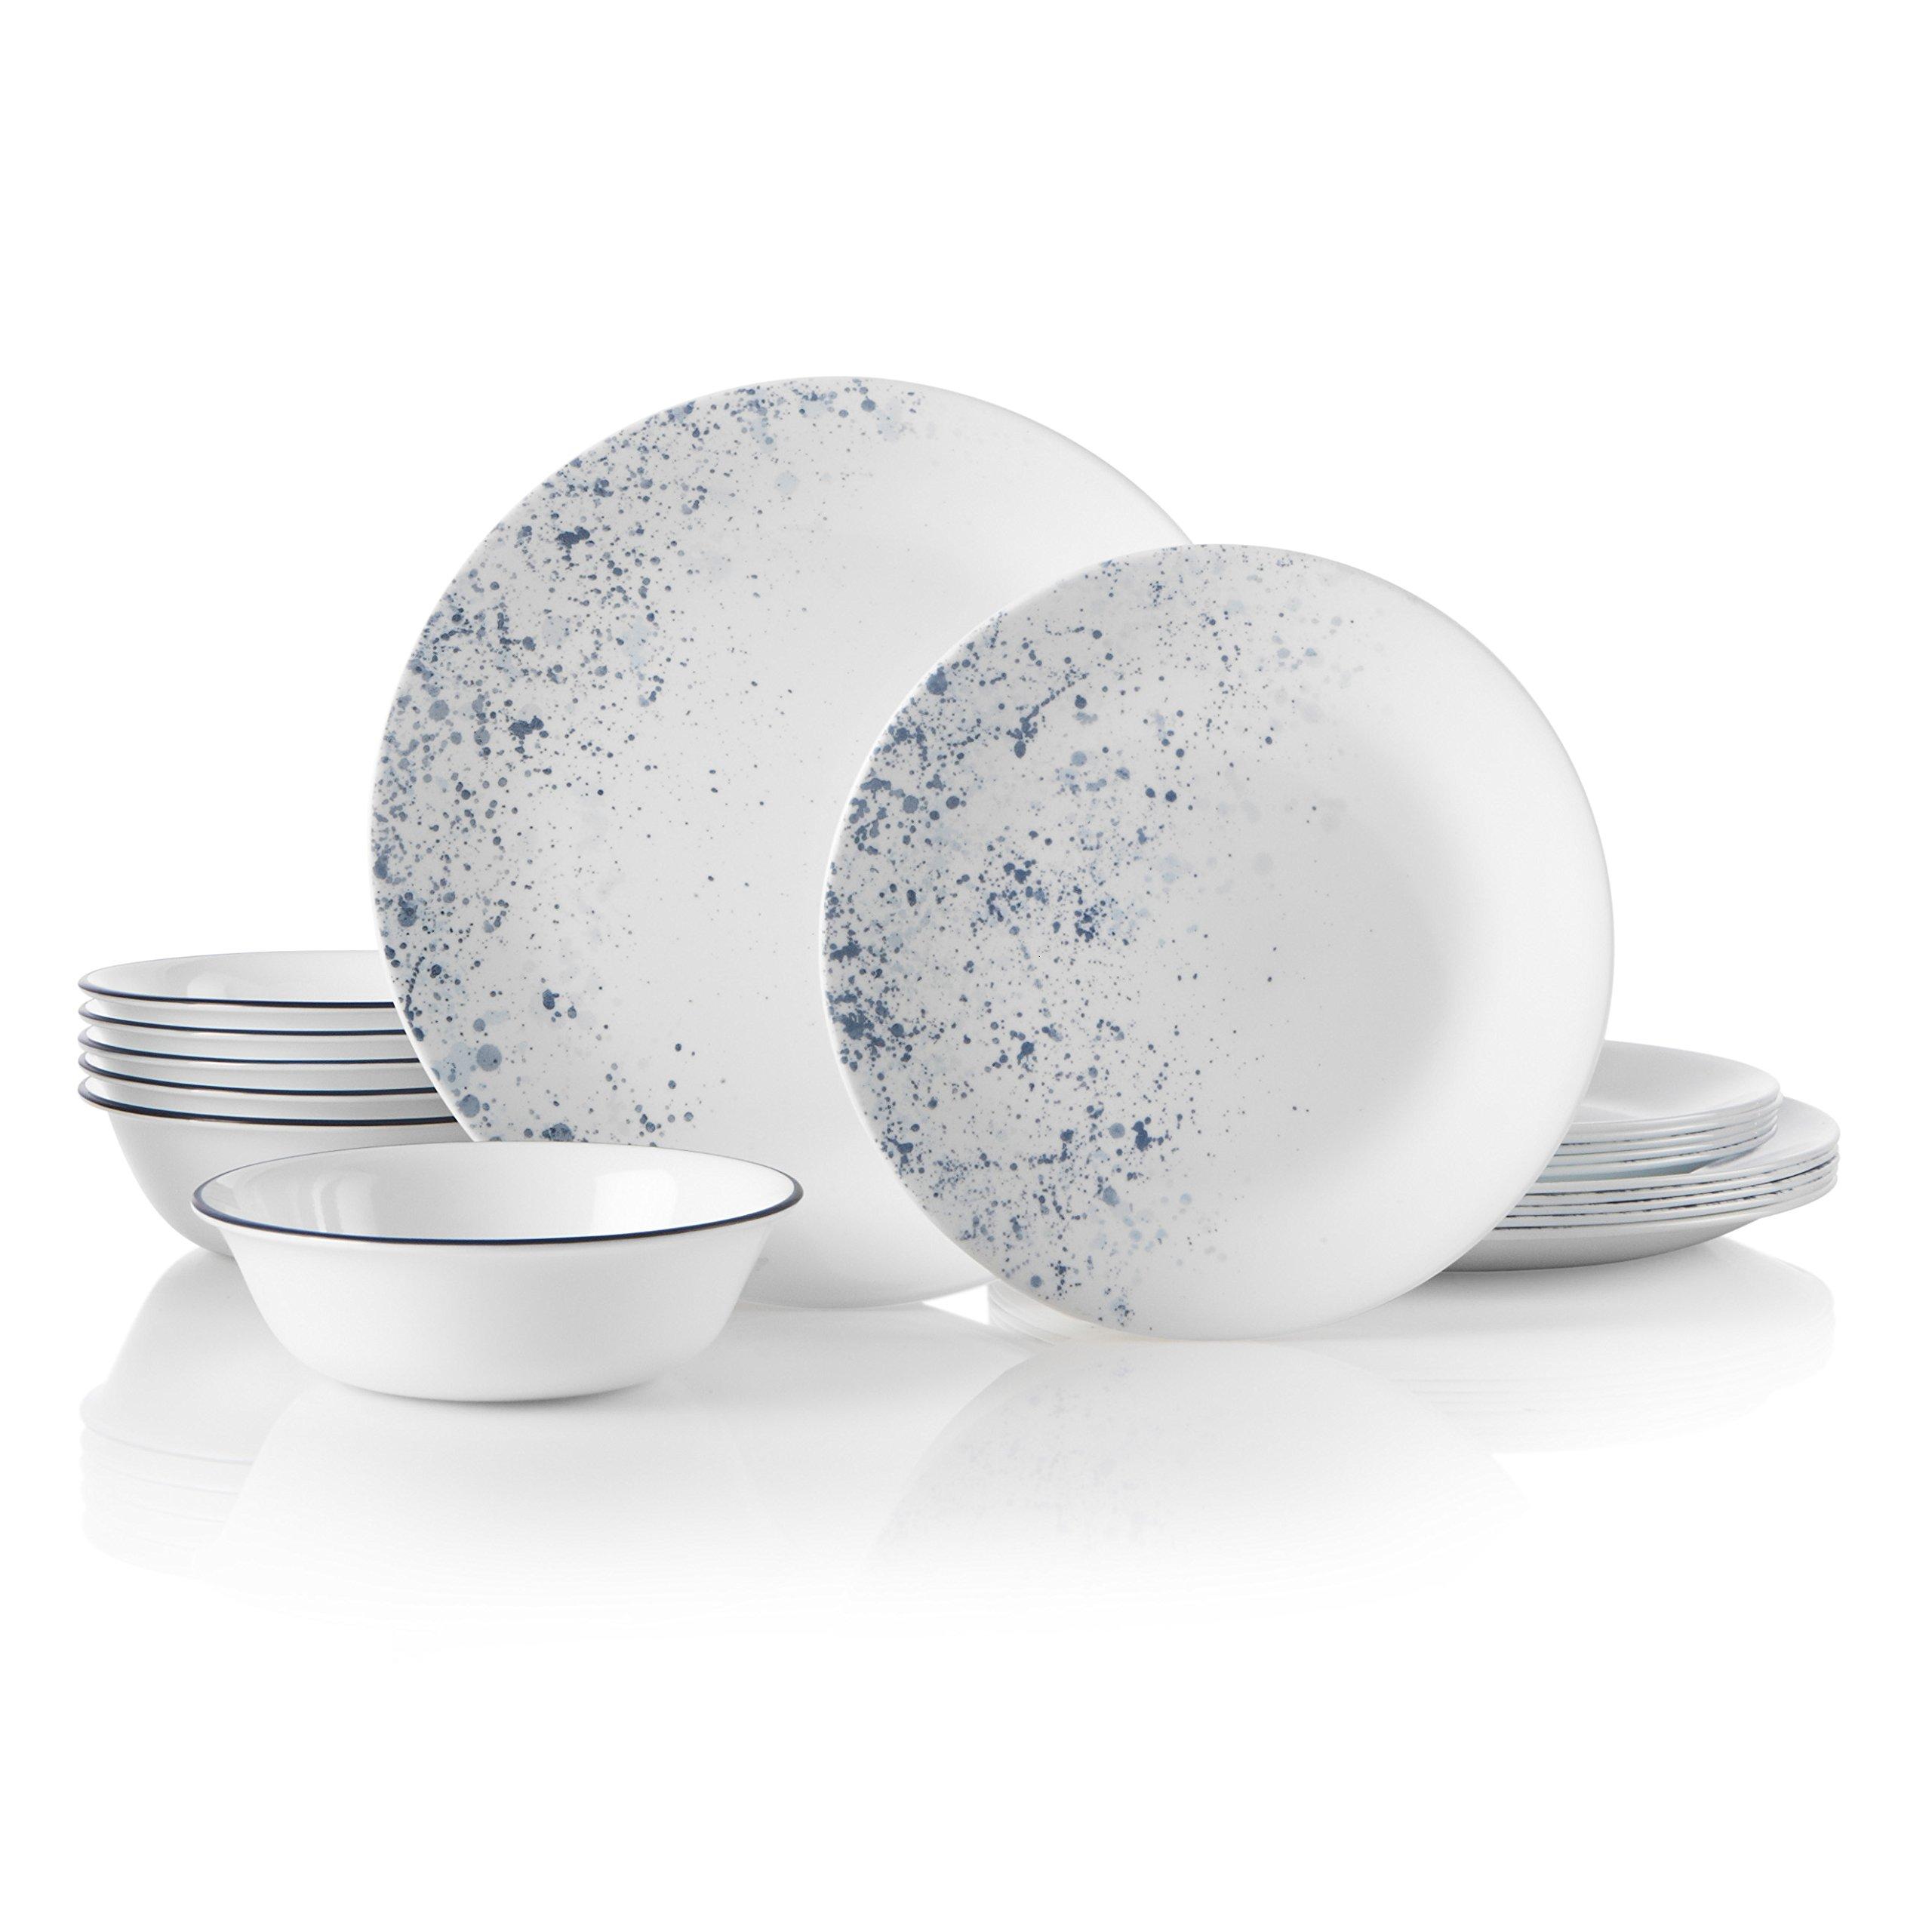 Corelle 18-Piece Service for 6, Chip Resistant, Indigo Speckle Dinnerware Set,